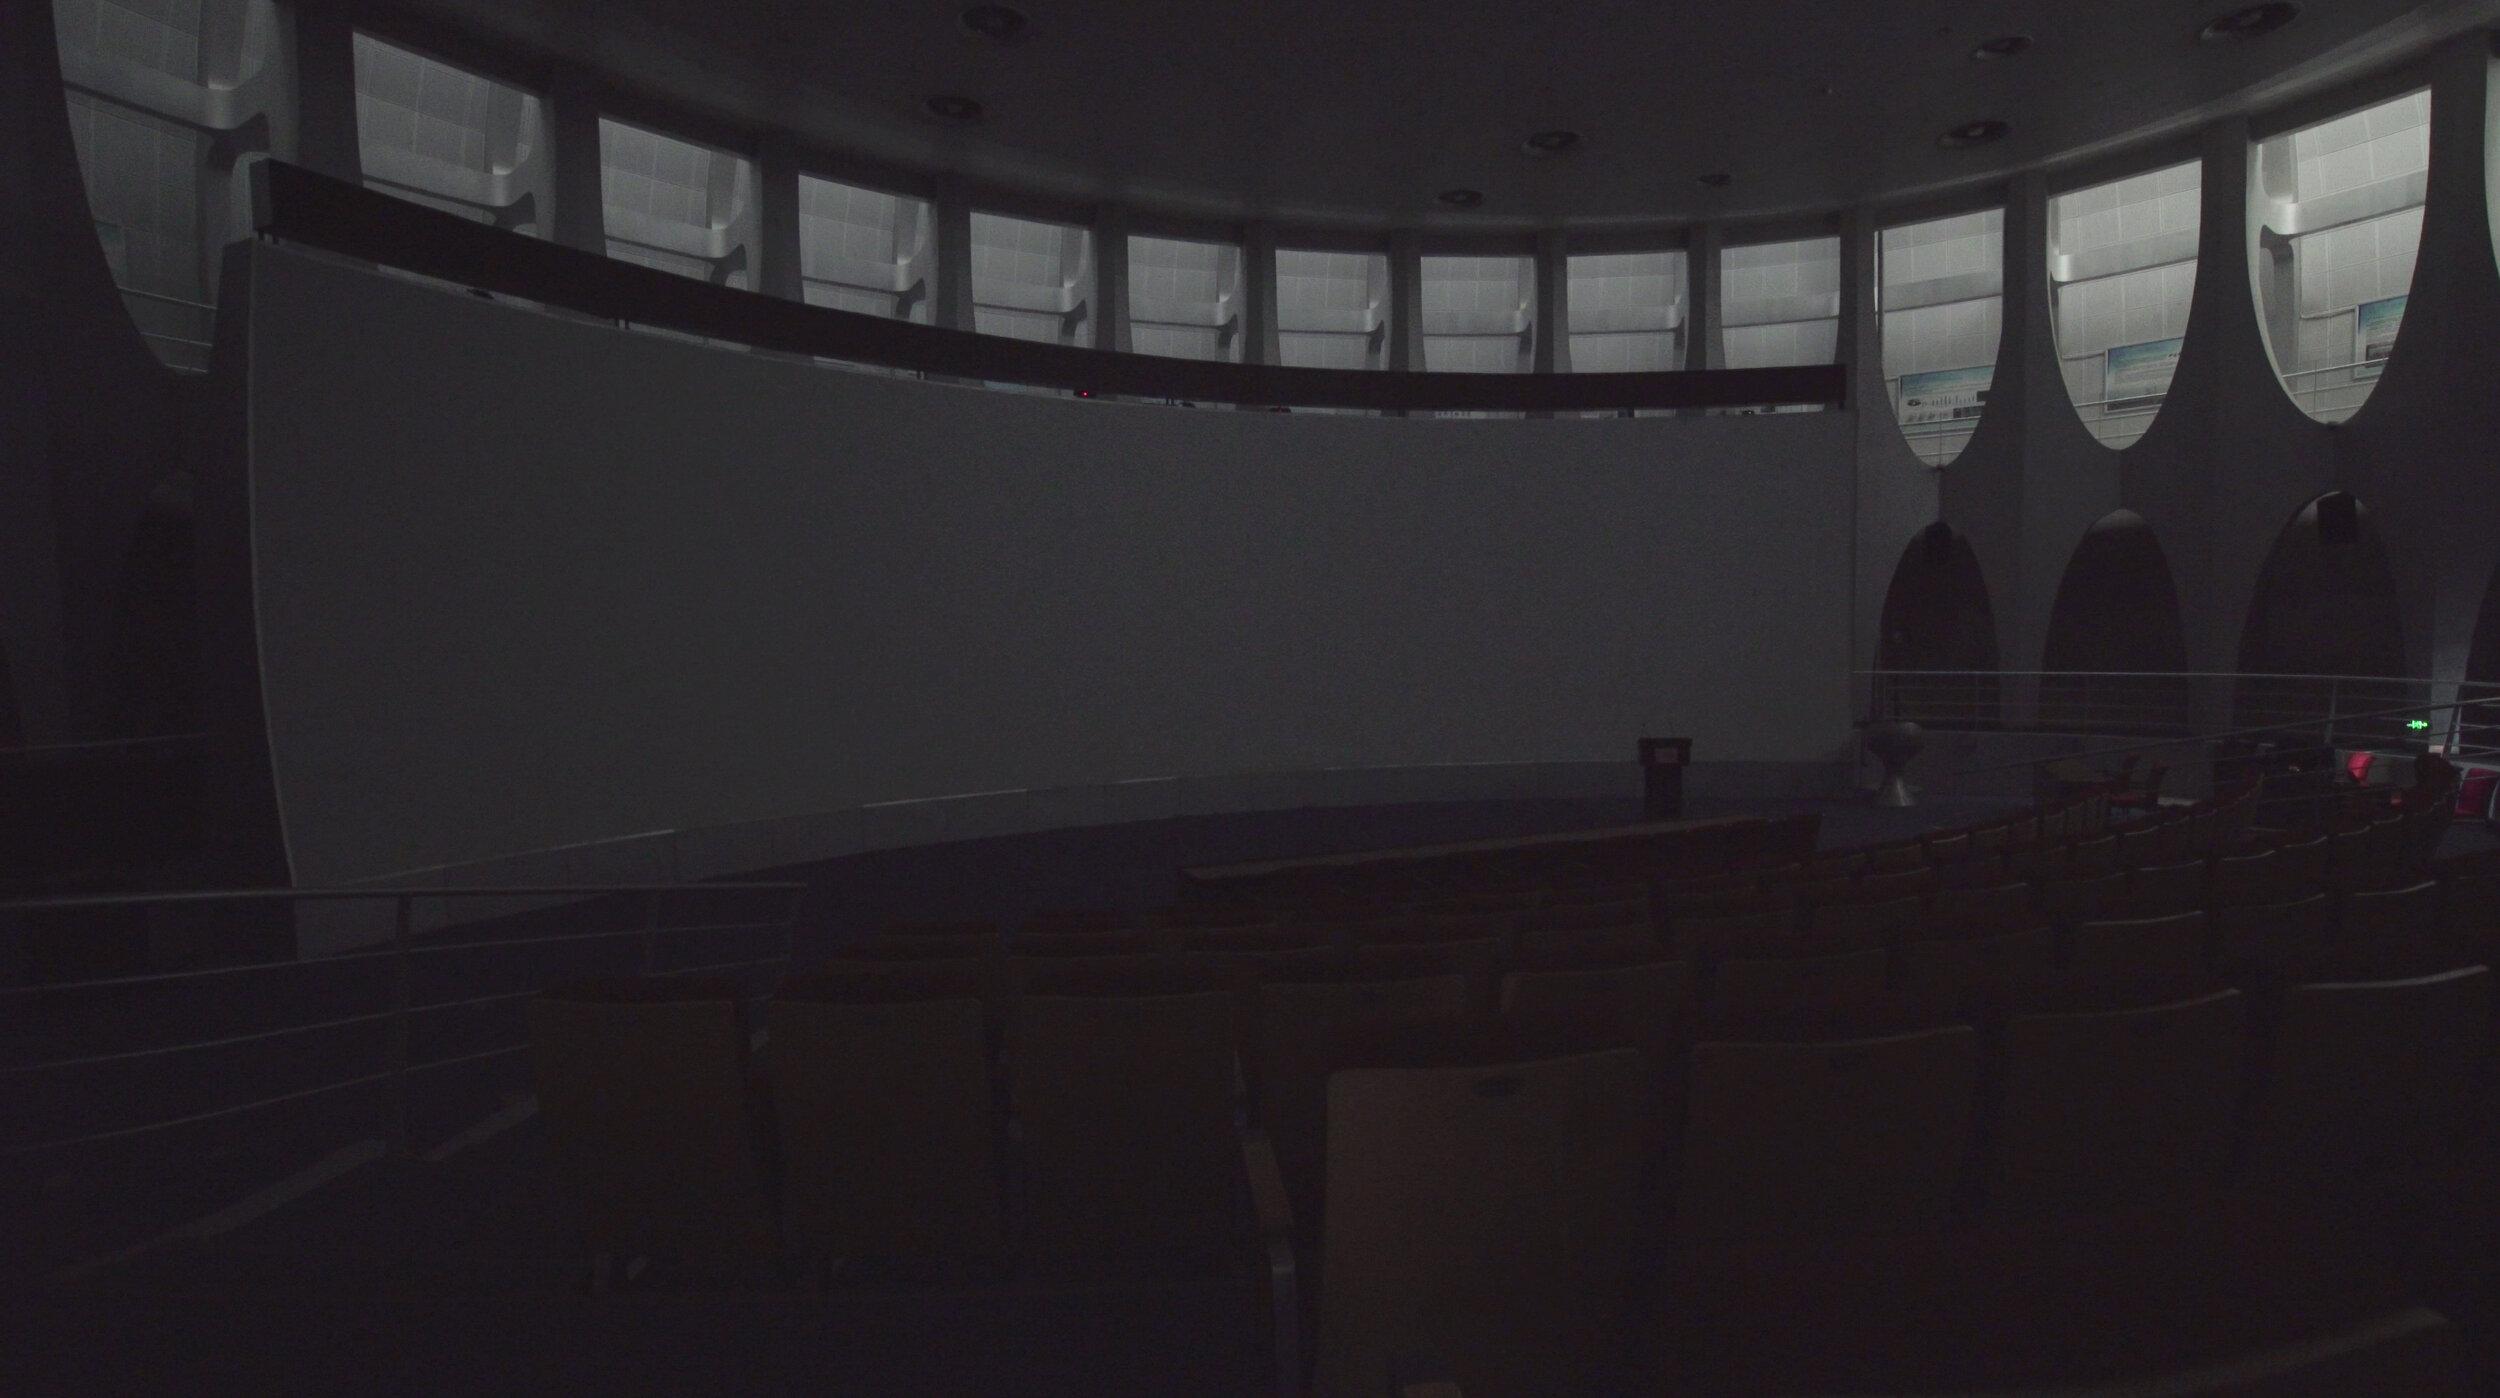 Framing Territories, Geocinema, кадр з відео, 2019